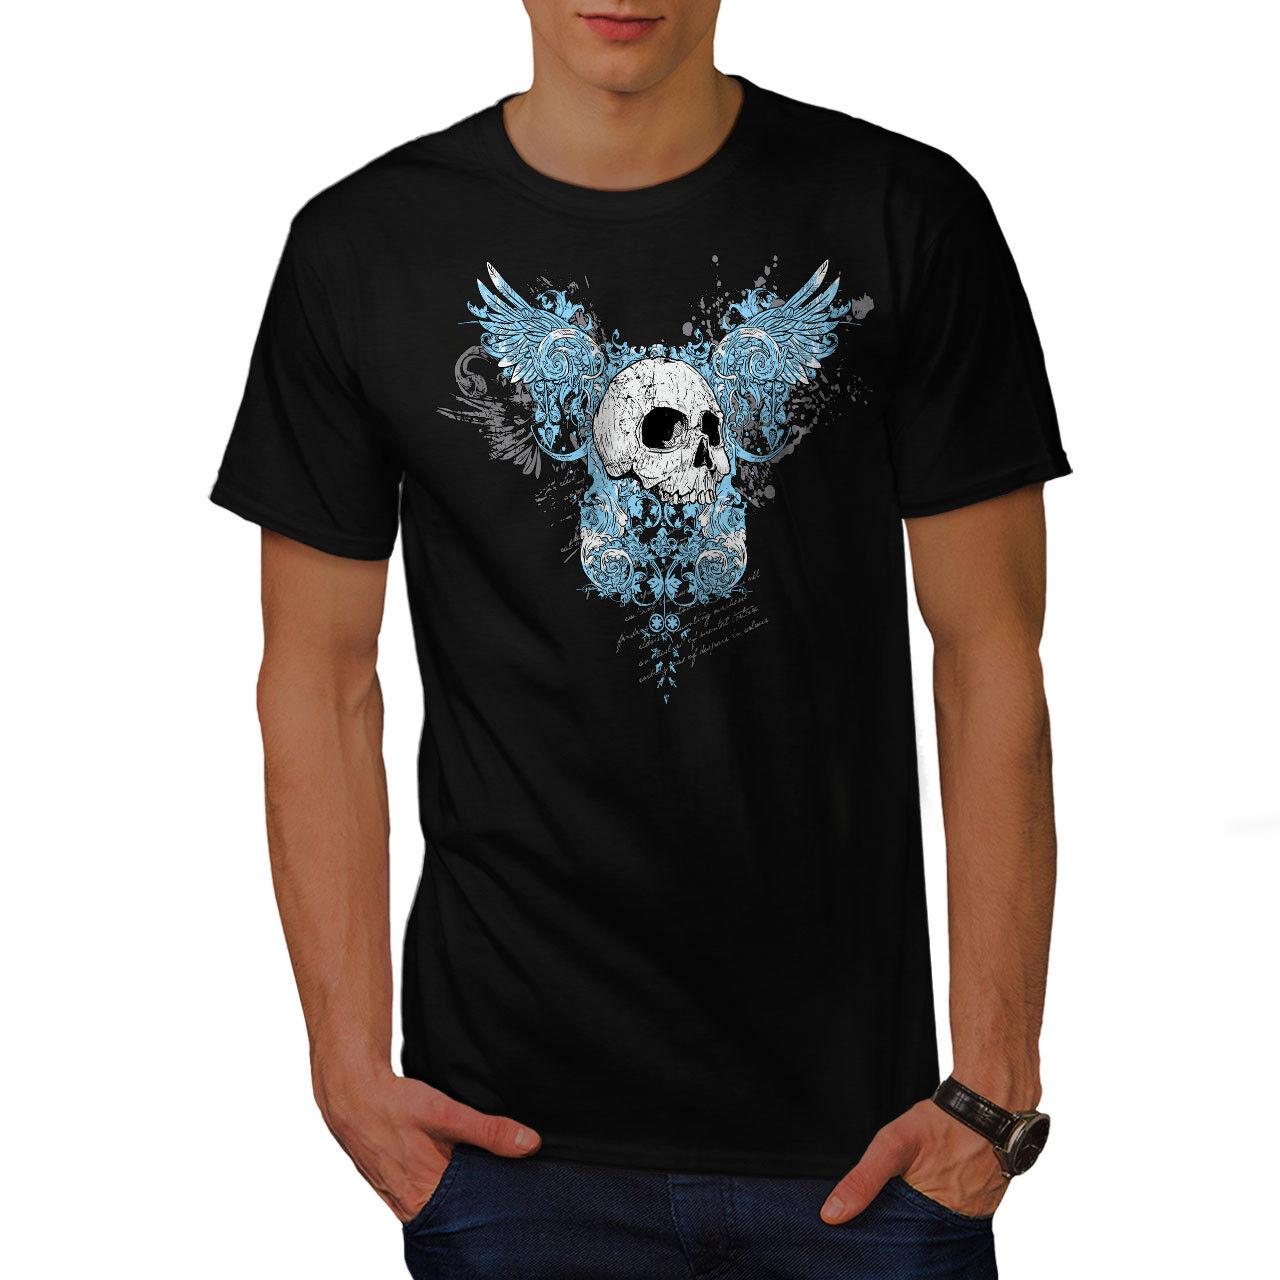 Wellcoda Wings Goth Biker Skull Mens Tank Top Angel Active Sports Shirt